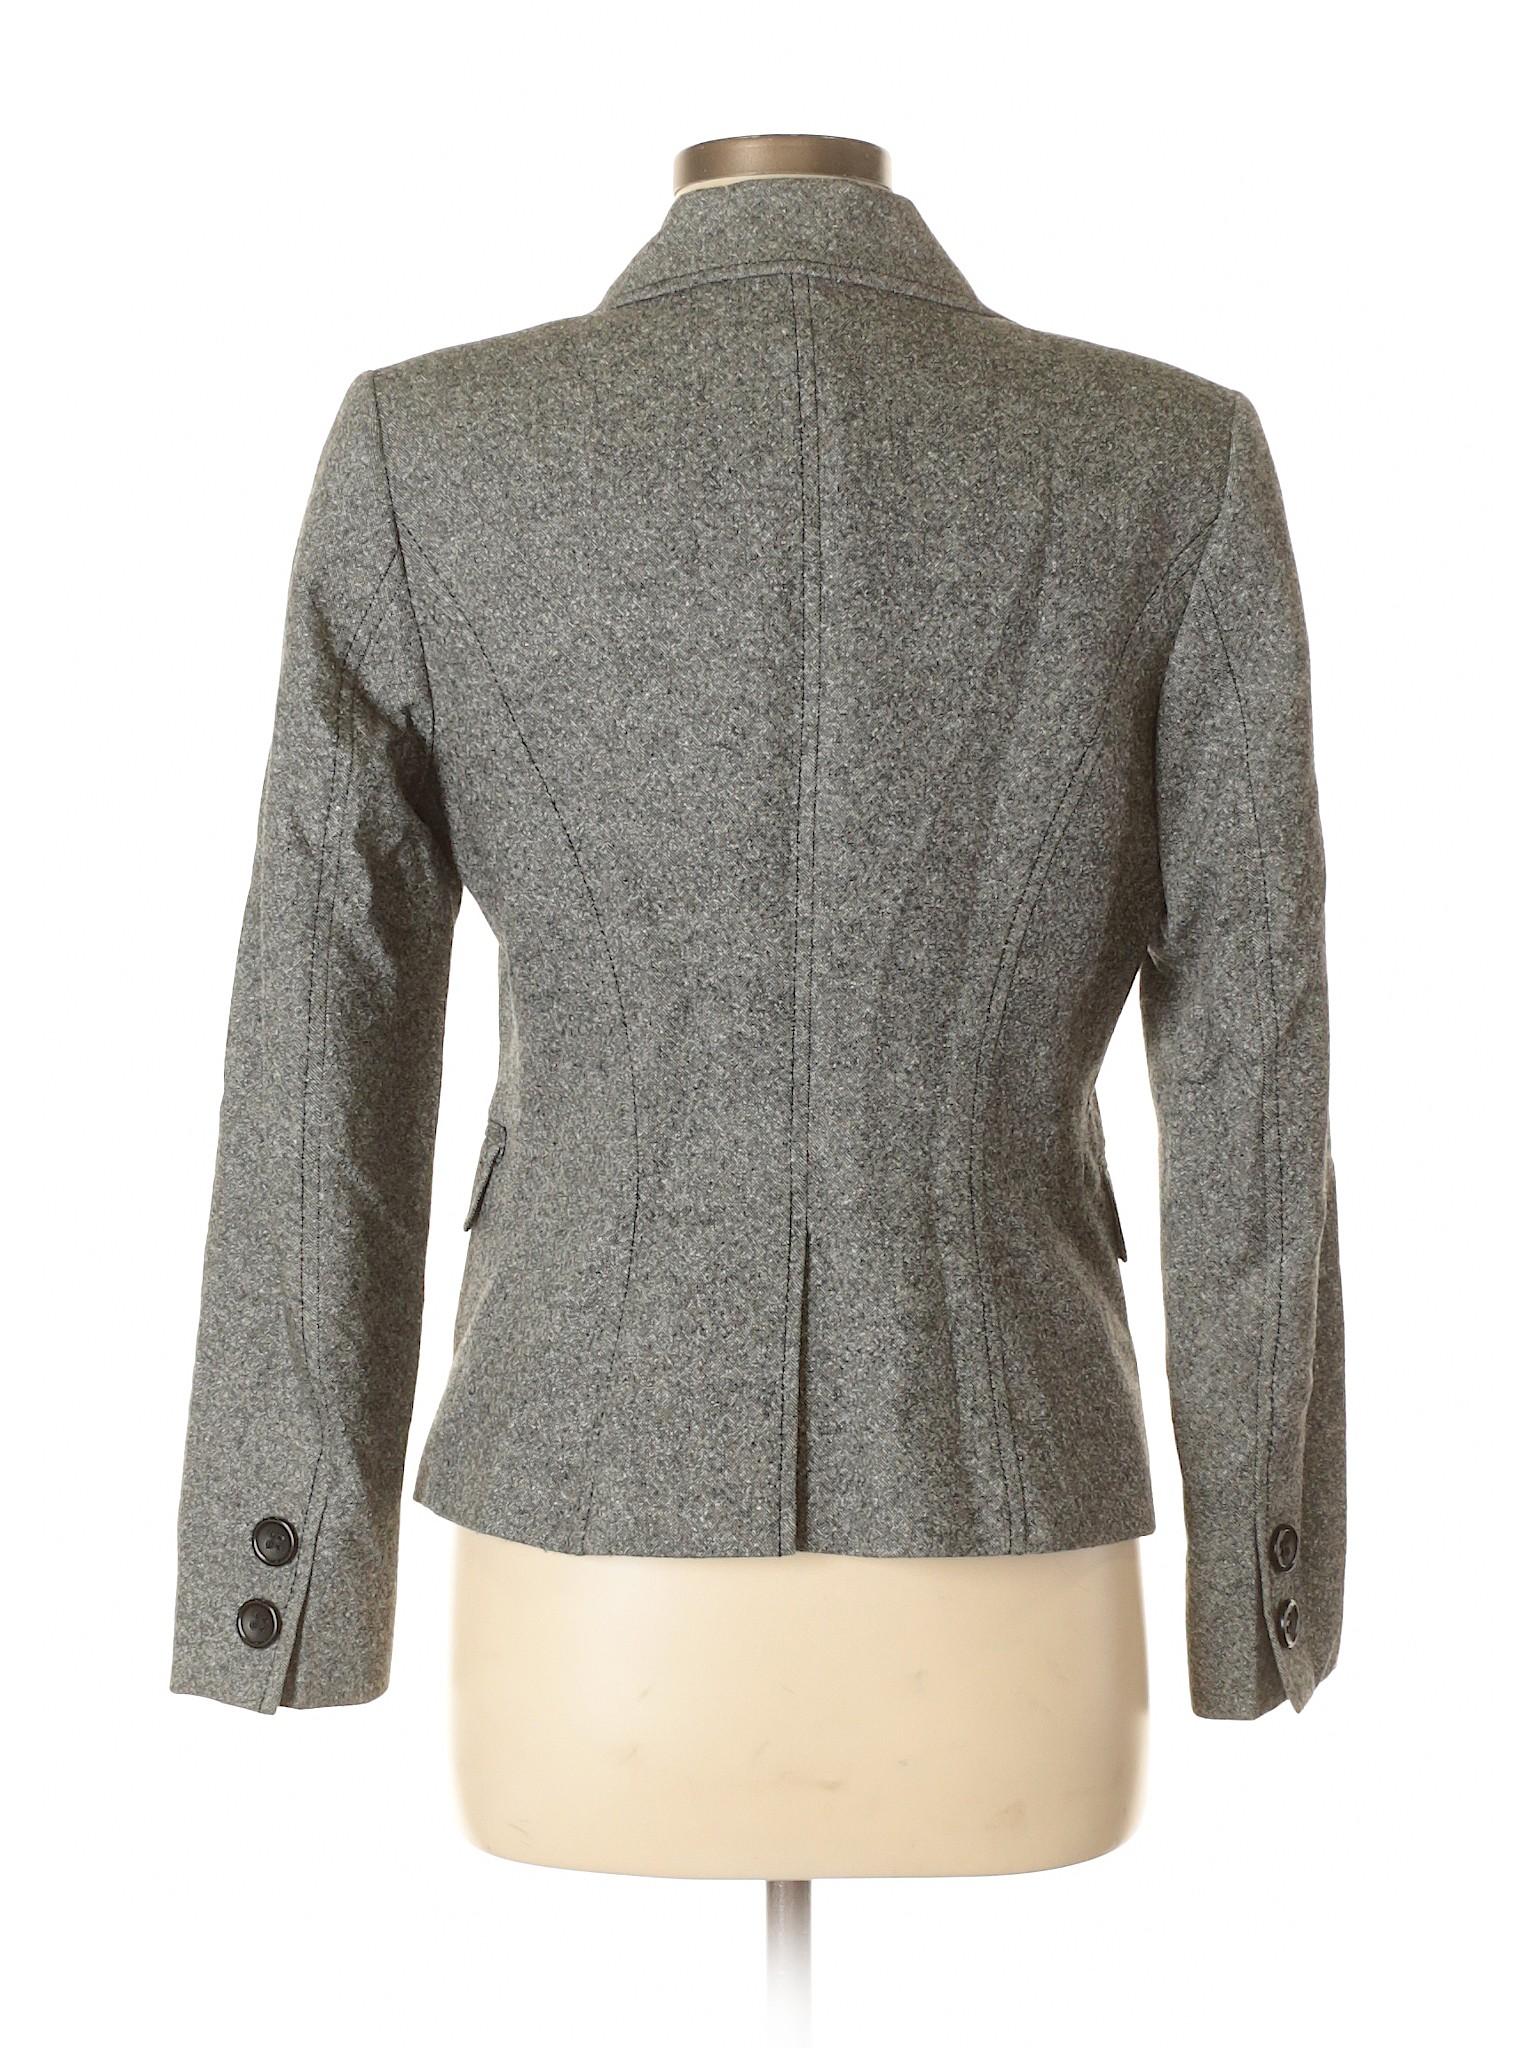 Blazer Boutique Wool Boutique leisure Pendleton leisure zgqXqwY